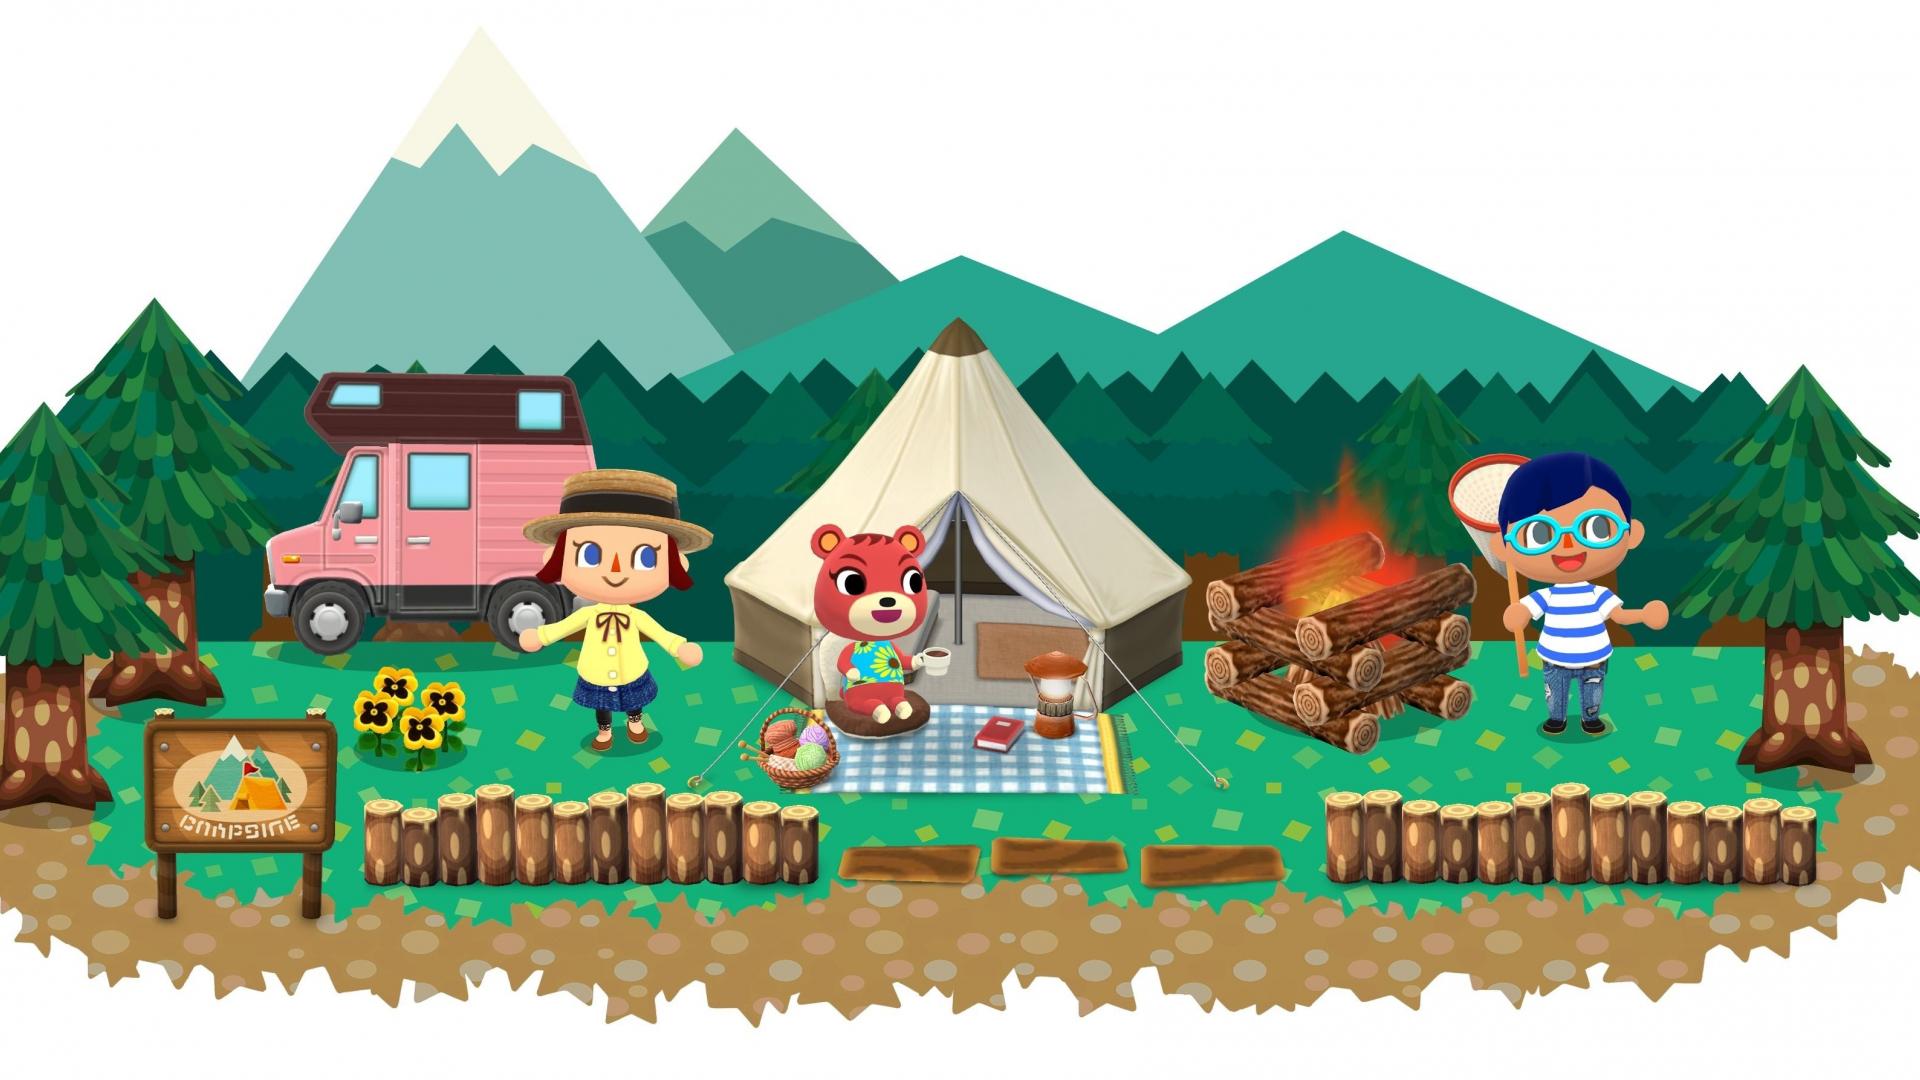 Download 1920x1080 Wallpaper Animal Crossing Pocket Camp